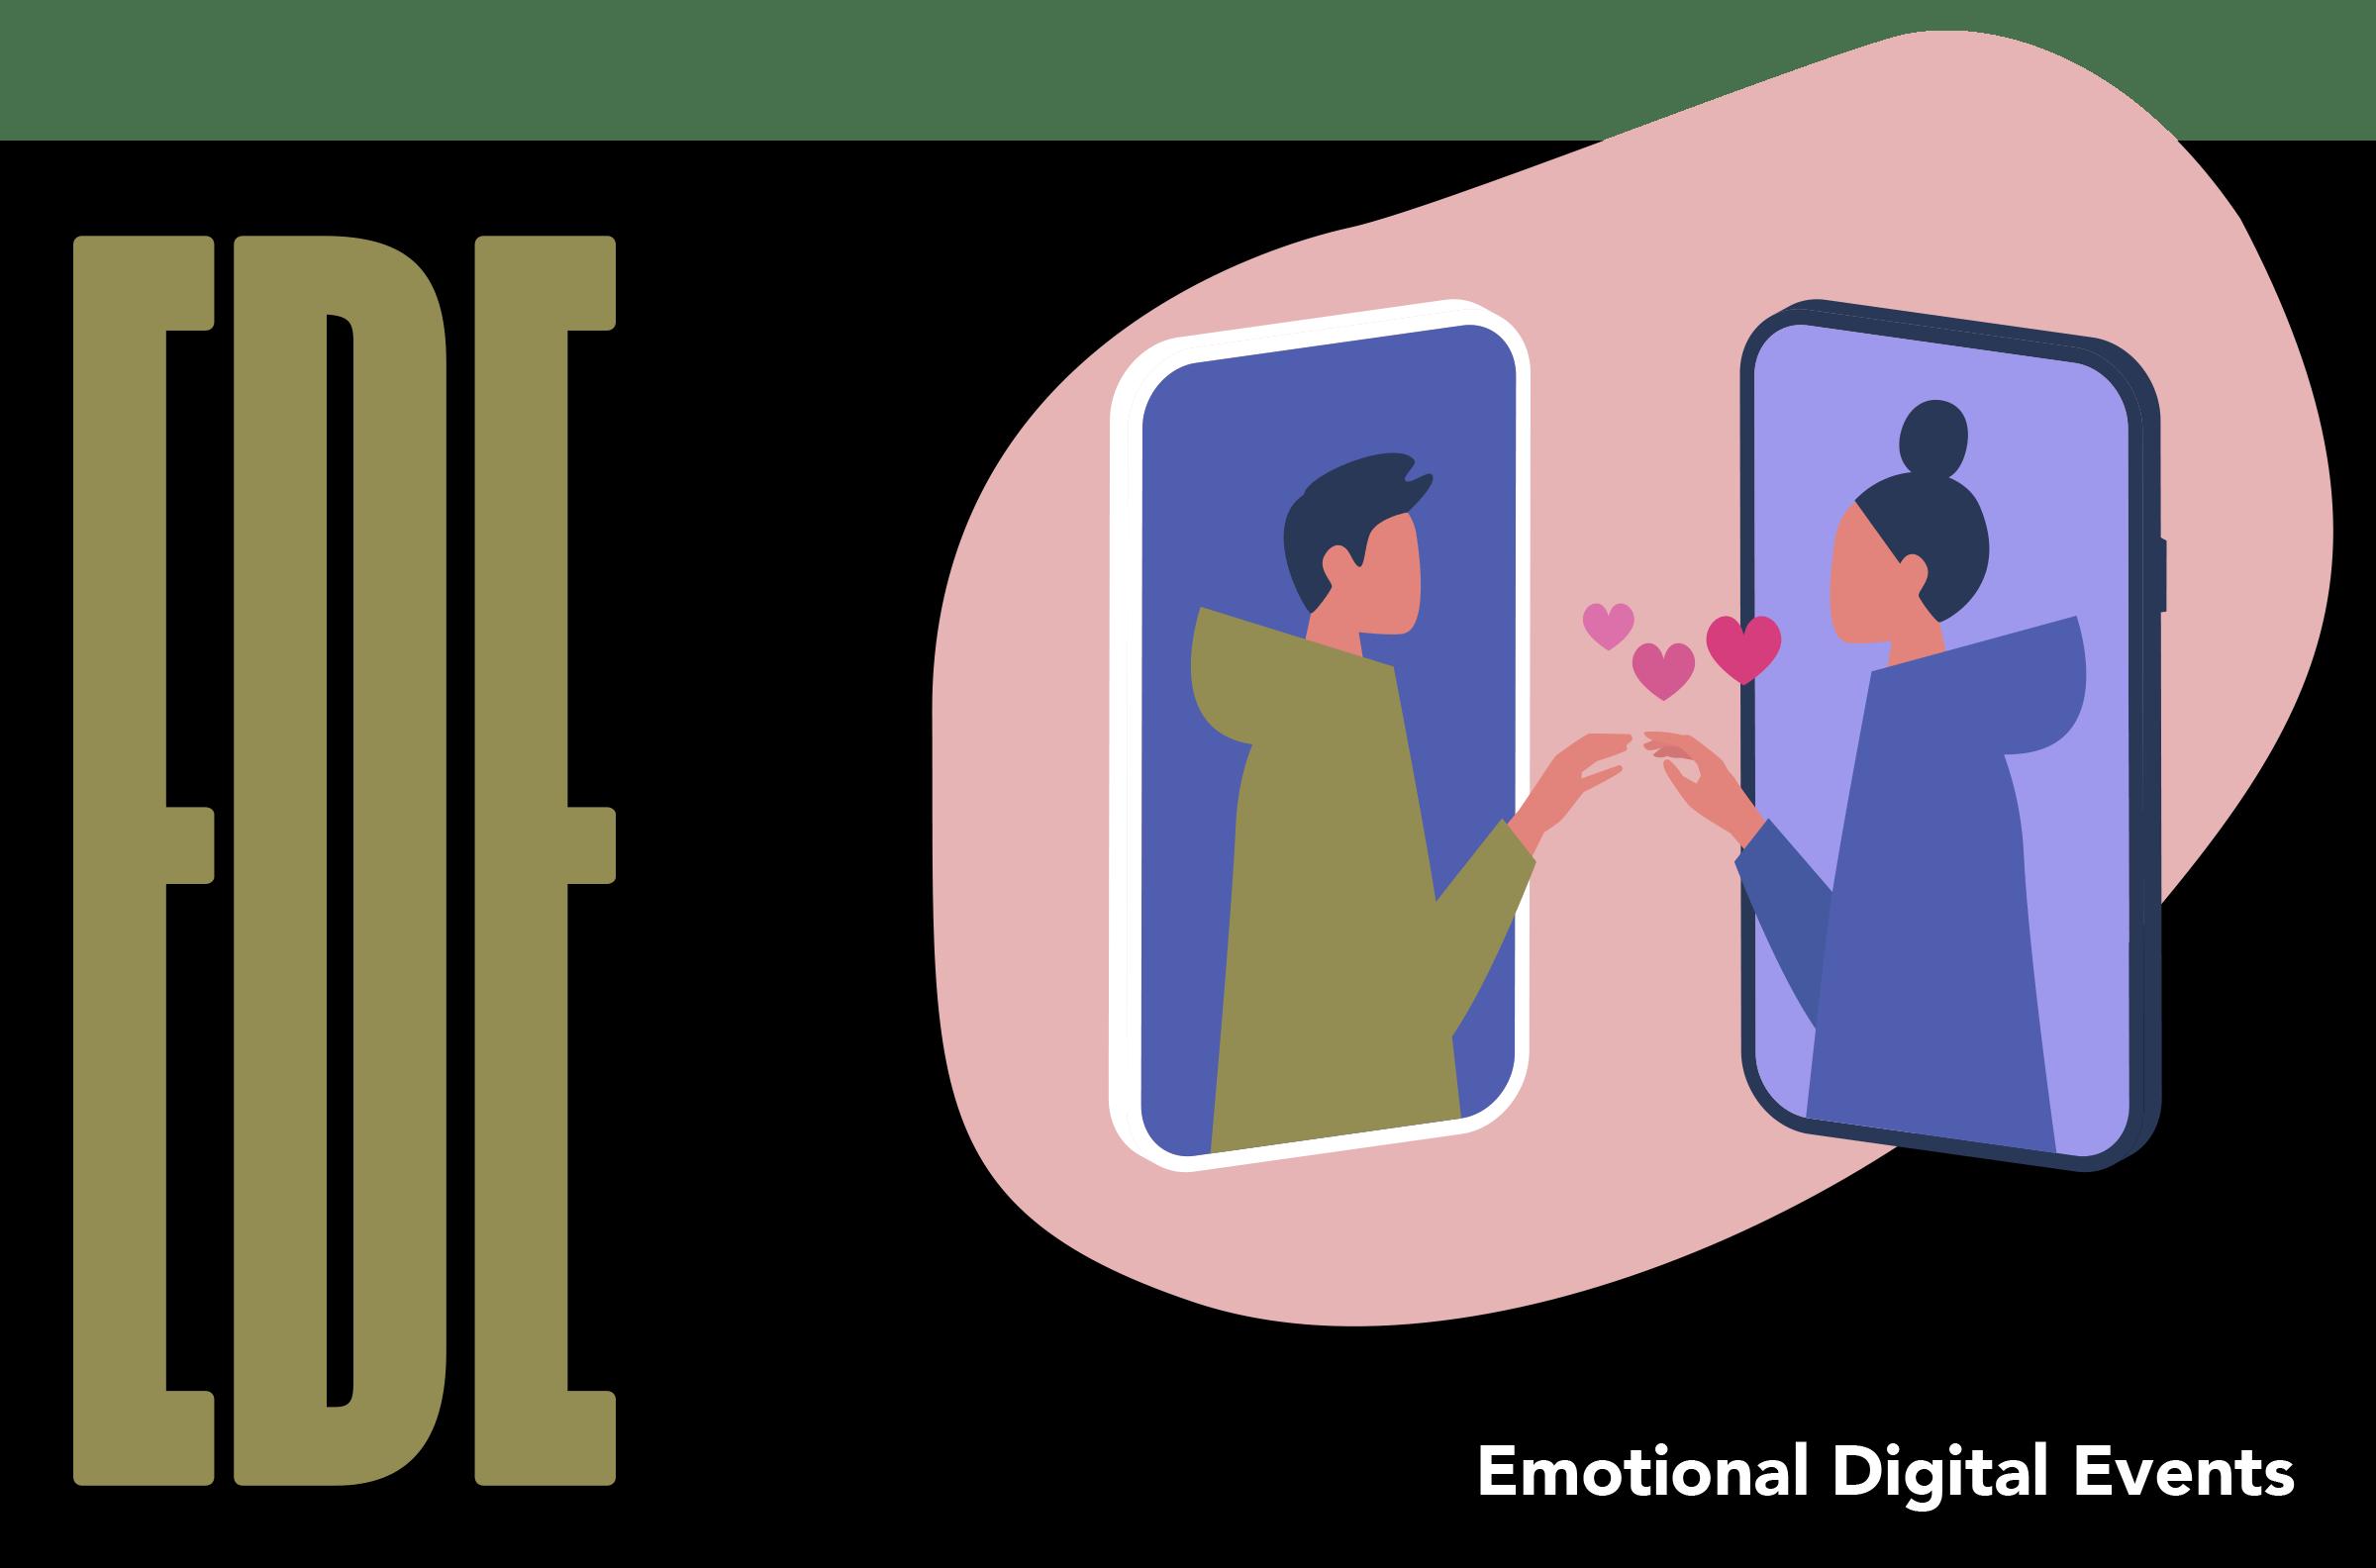 ede-emma-2